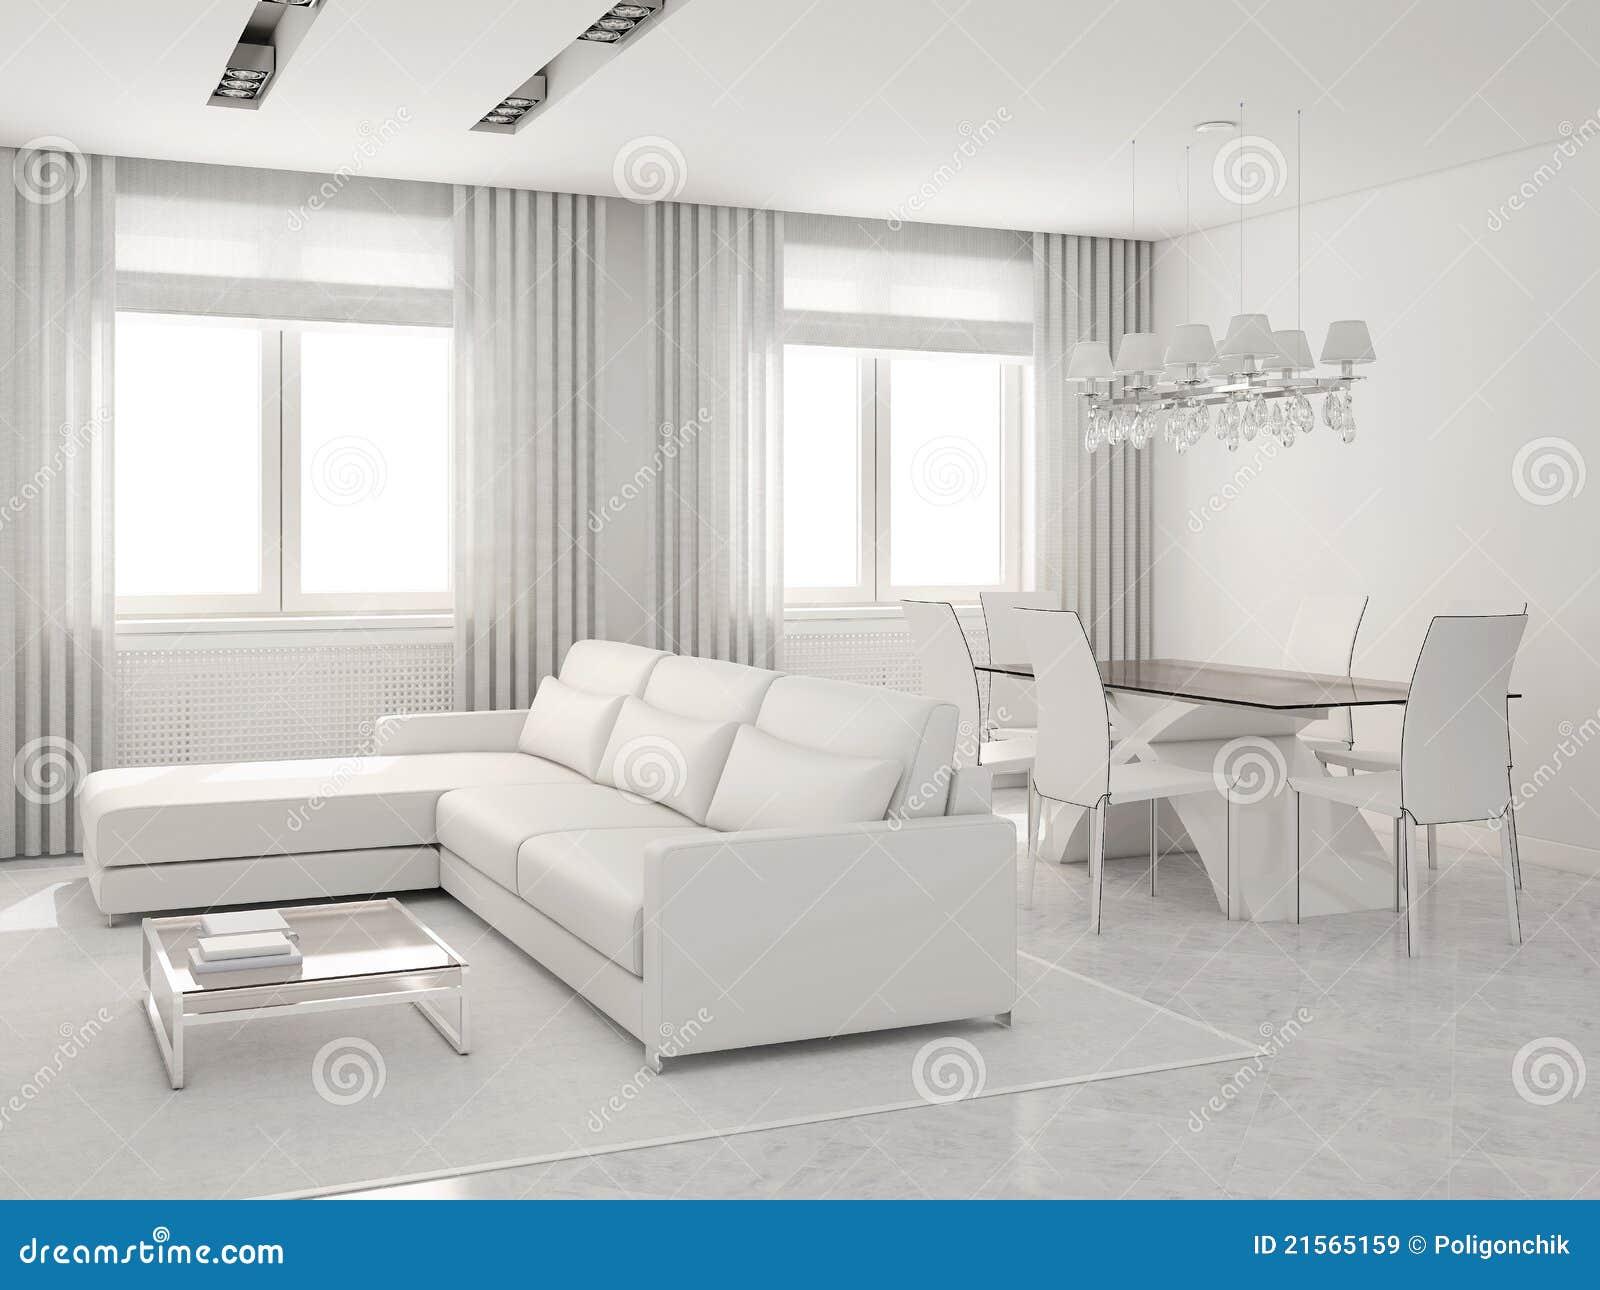 Modern binnenland van woonkamer en eetkamer royalty vrije stock afbeeldingen afbeelding 21565159 - Eetkamer en woonkamer ...